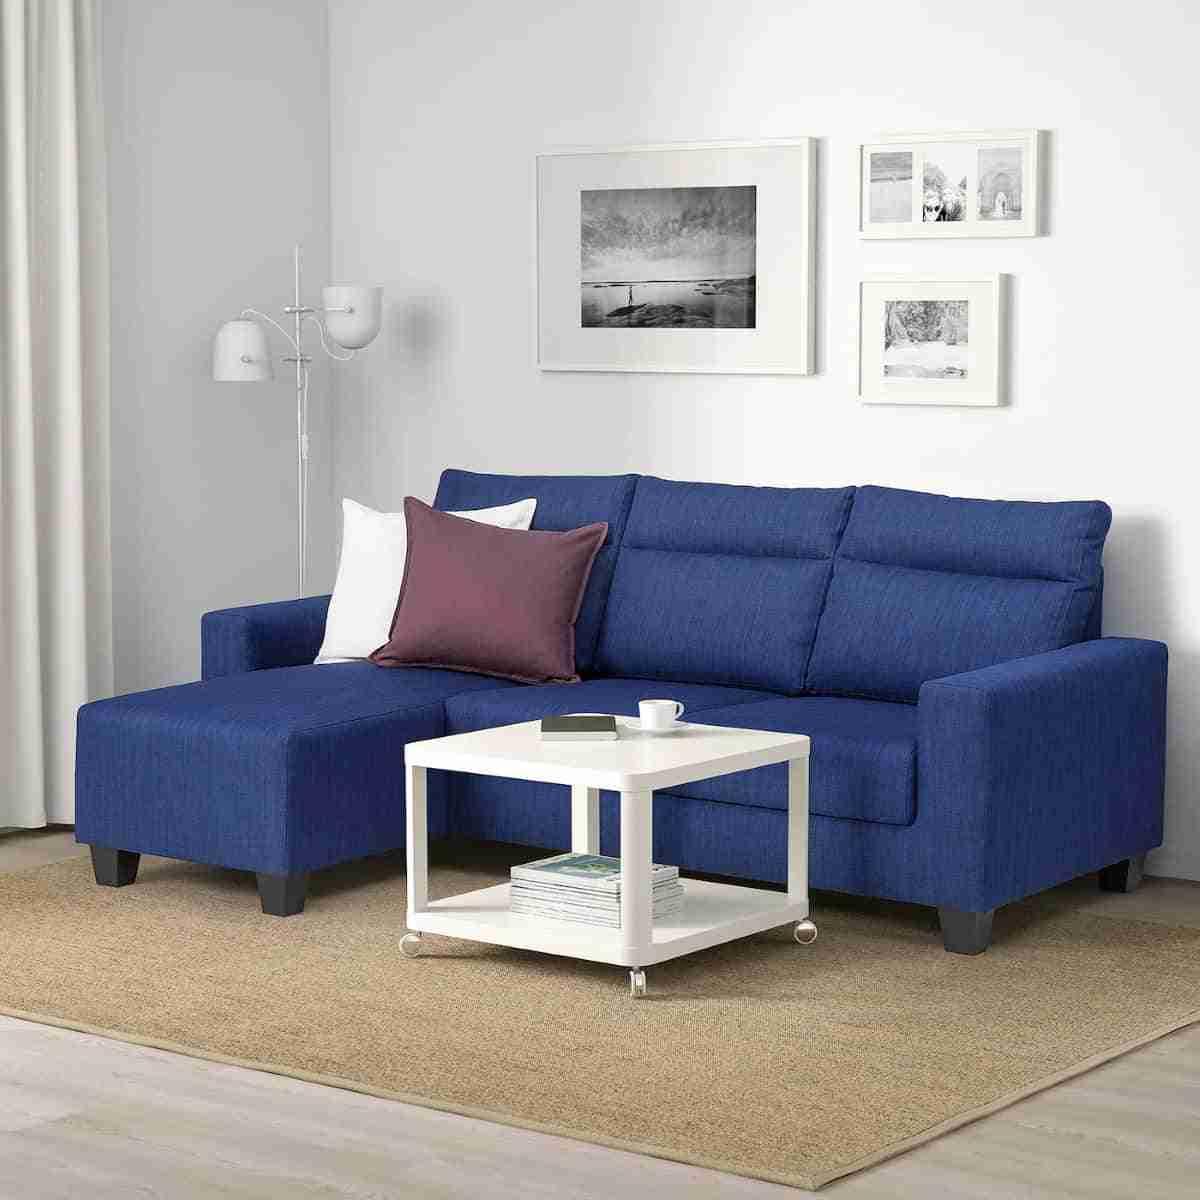 sofas de tres plazas de ikea